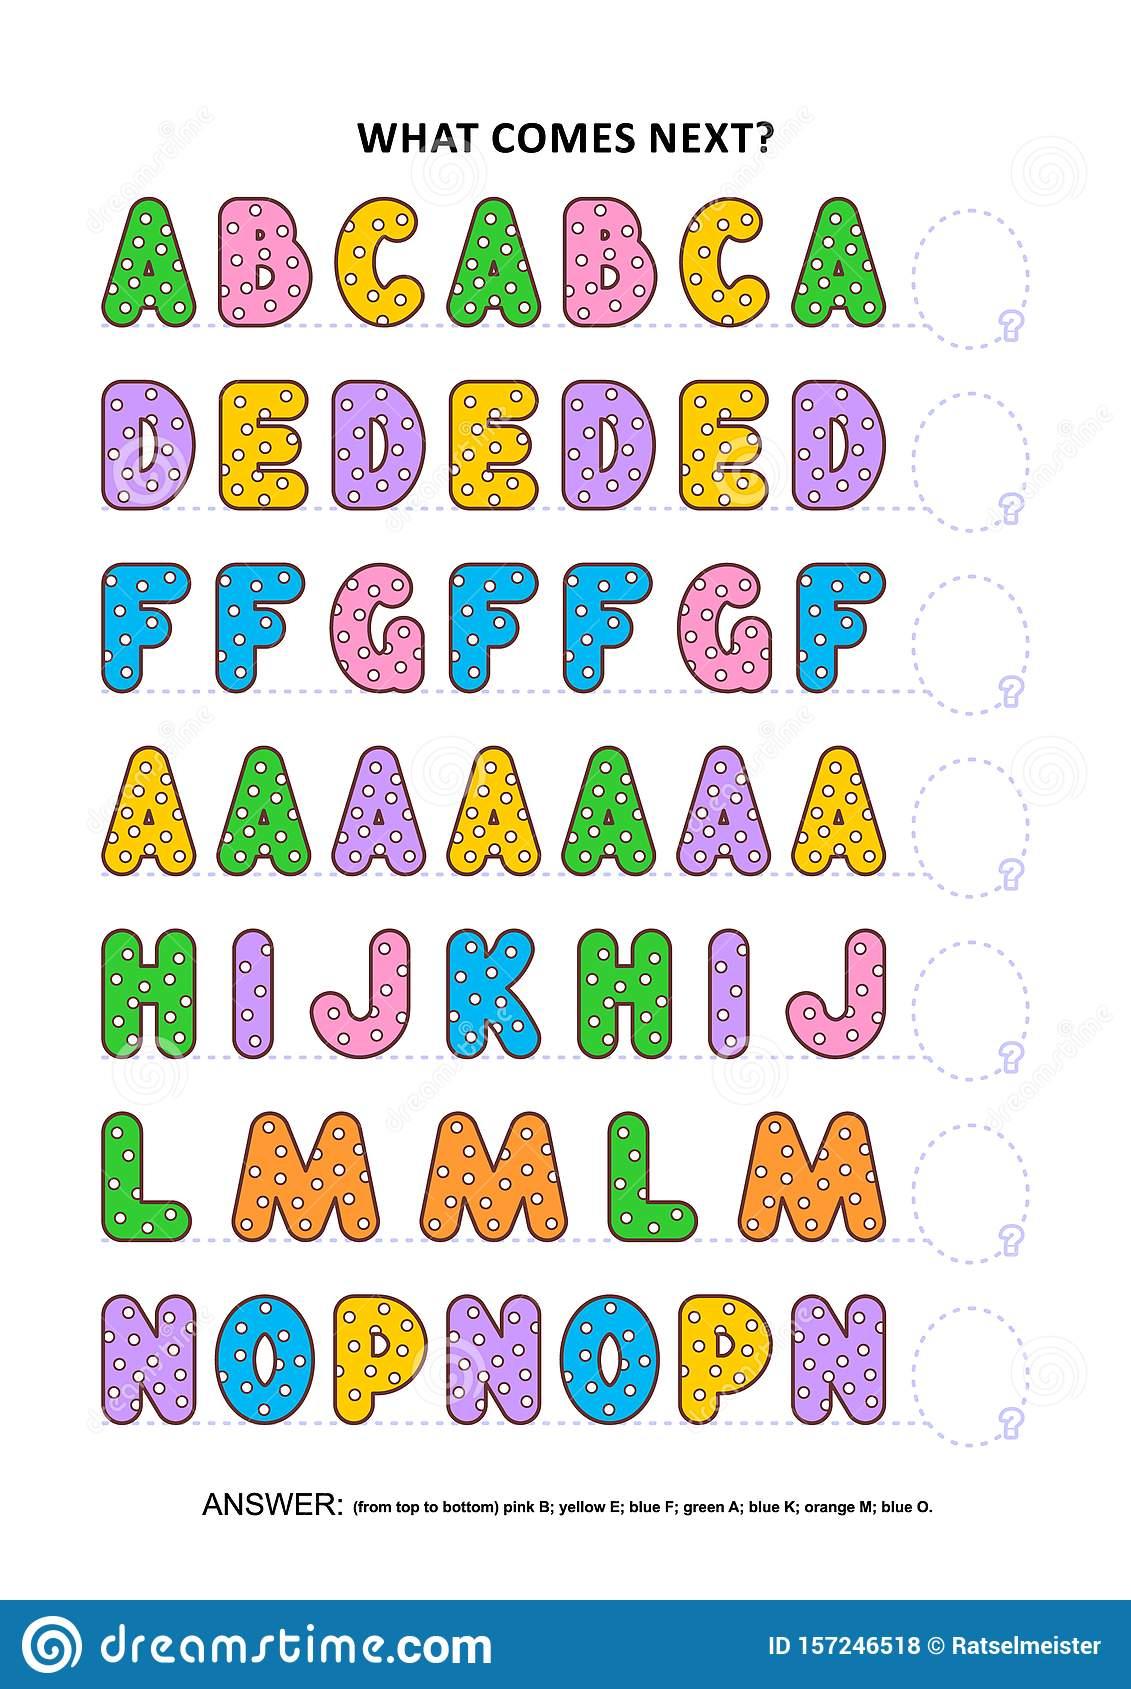 Basic Skills Practice Worksheet - Sequential Pattern regarding Letter Logic Worksheets Answers